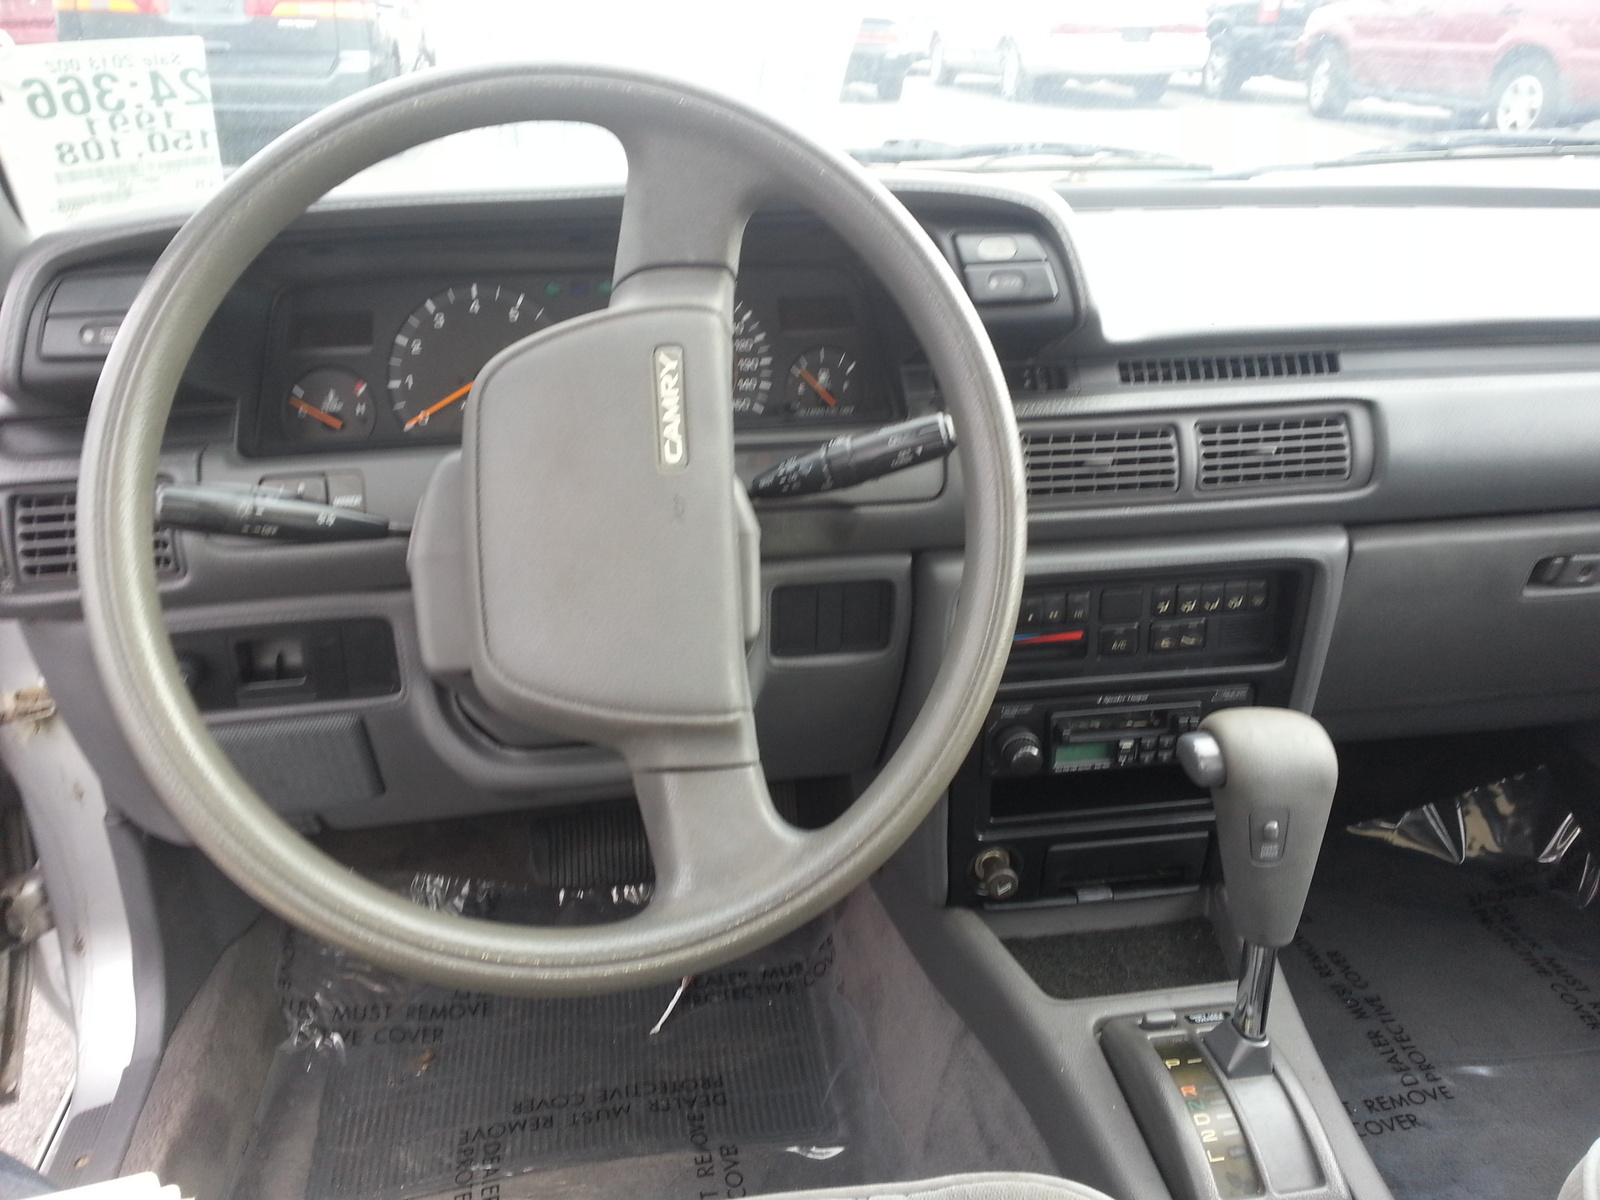 1989 Toyota Camry - Pictures - CarGurus  |1987 Toyota Camry Interior